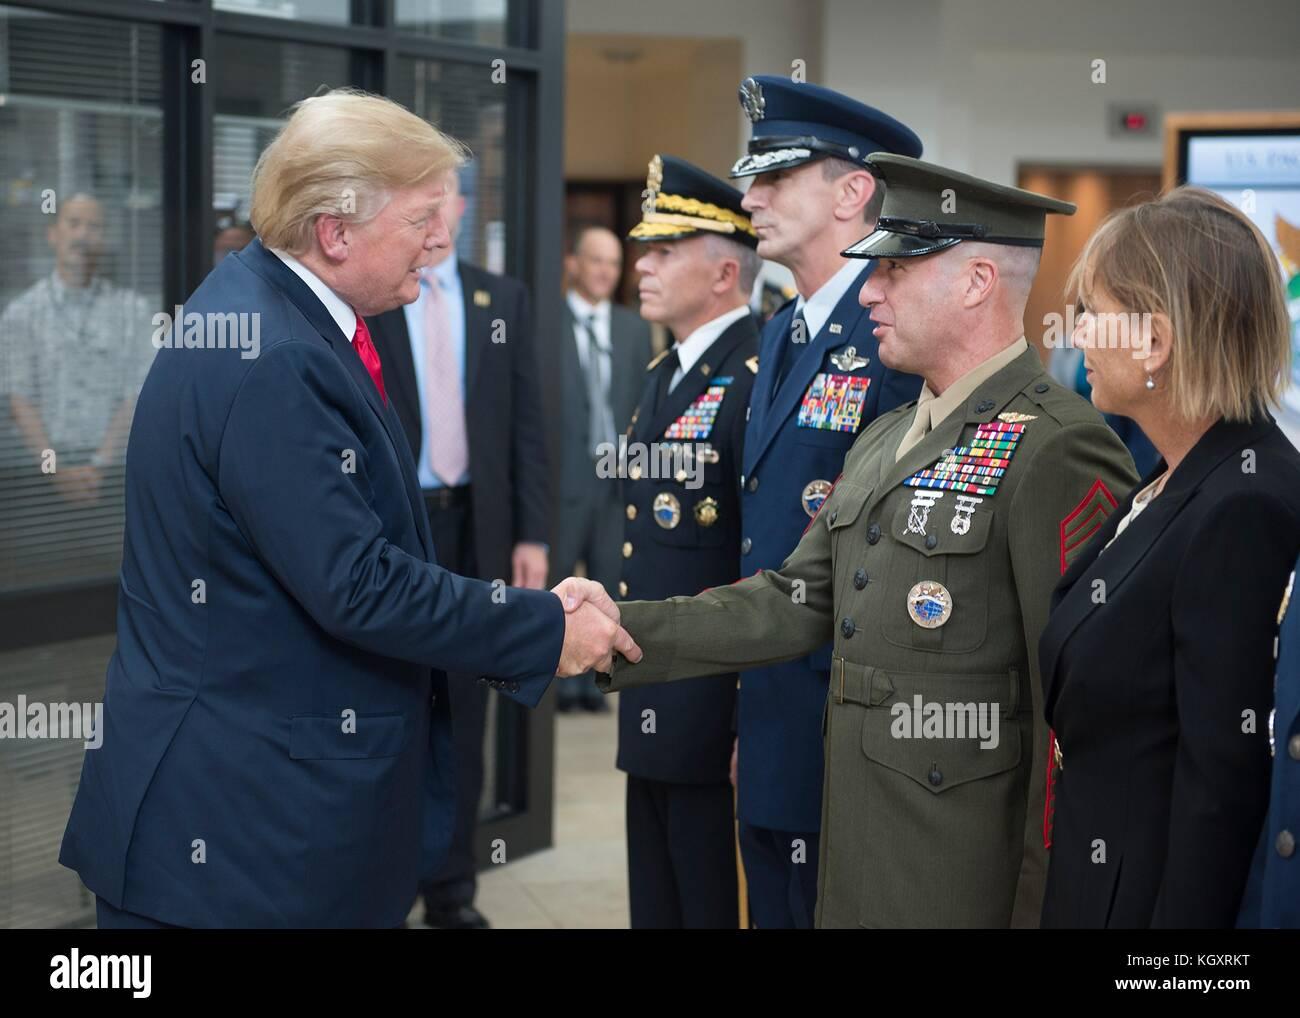 U.S. President Donald Trump (left) greets U.S. Pacific Command (USPACOM) Senior Enlisted Leader Anthony Spadaro - Stock Image